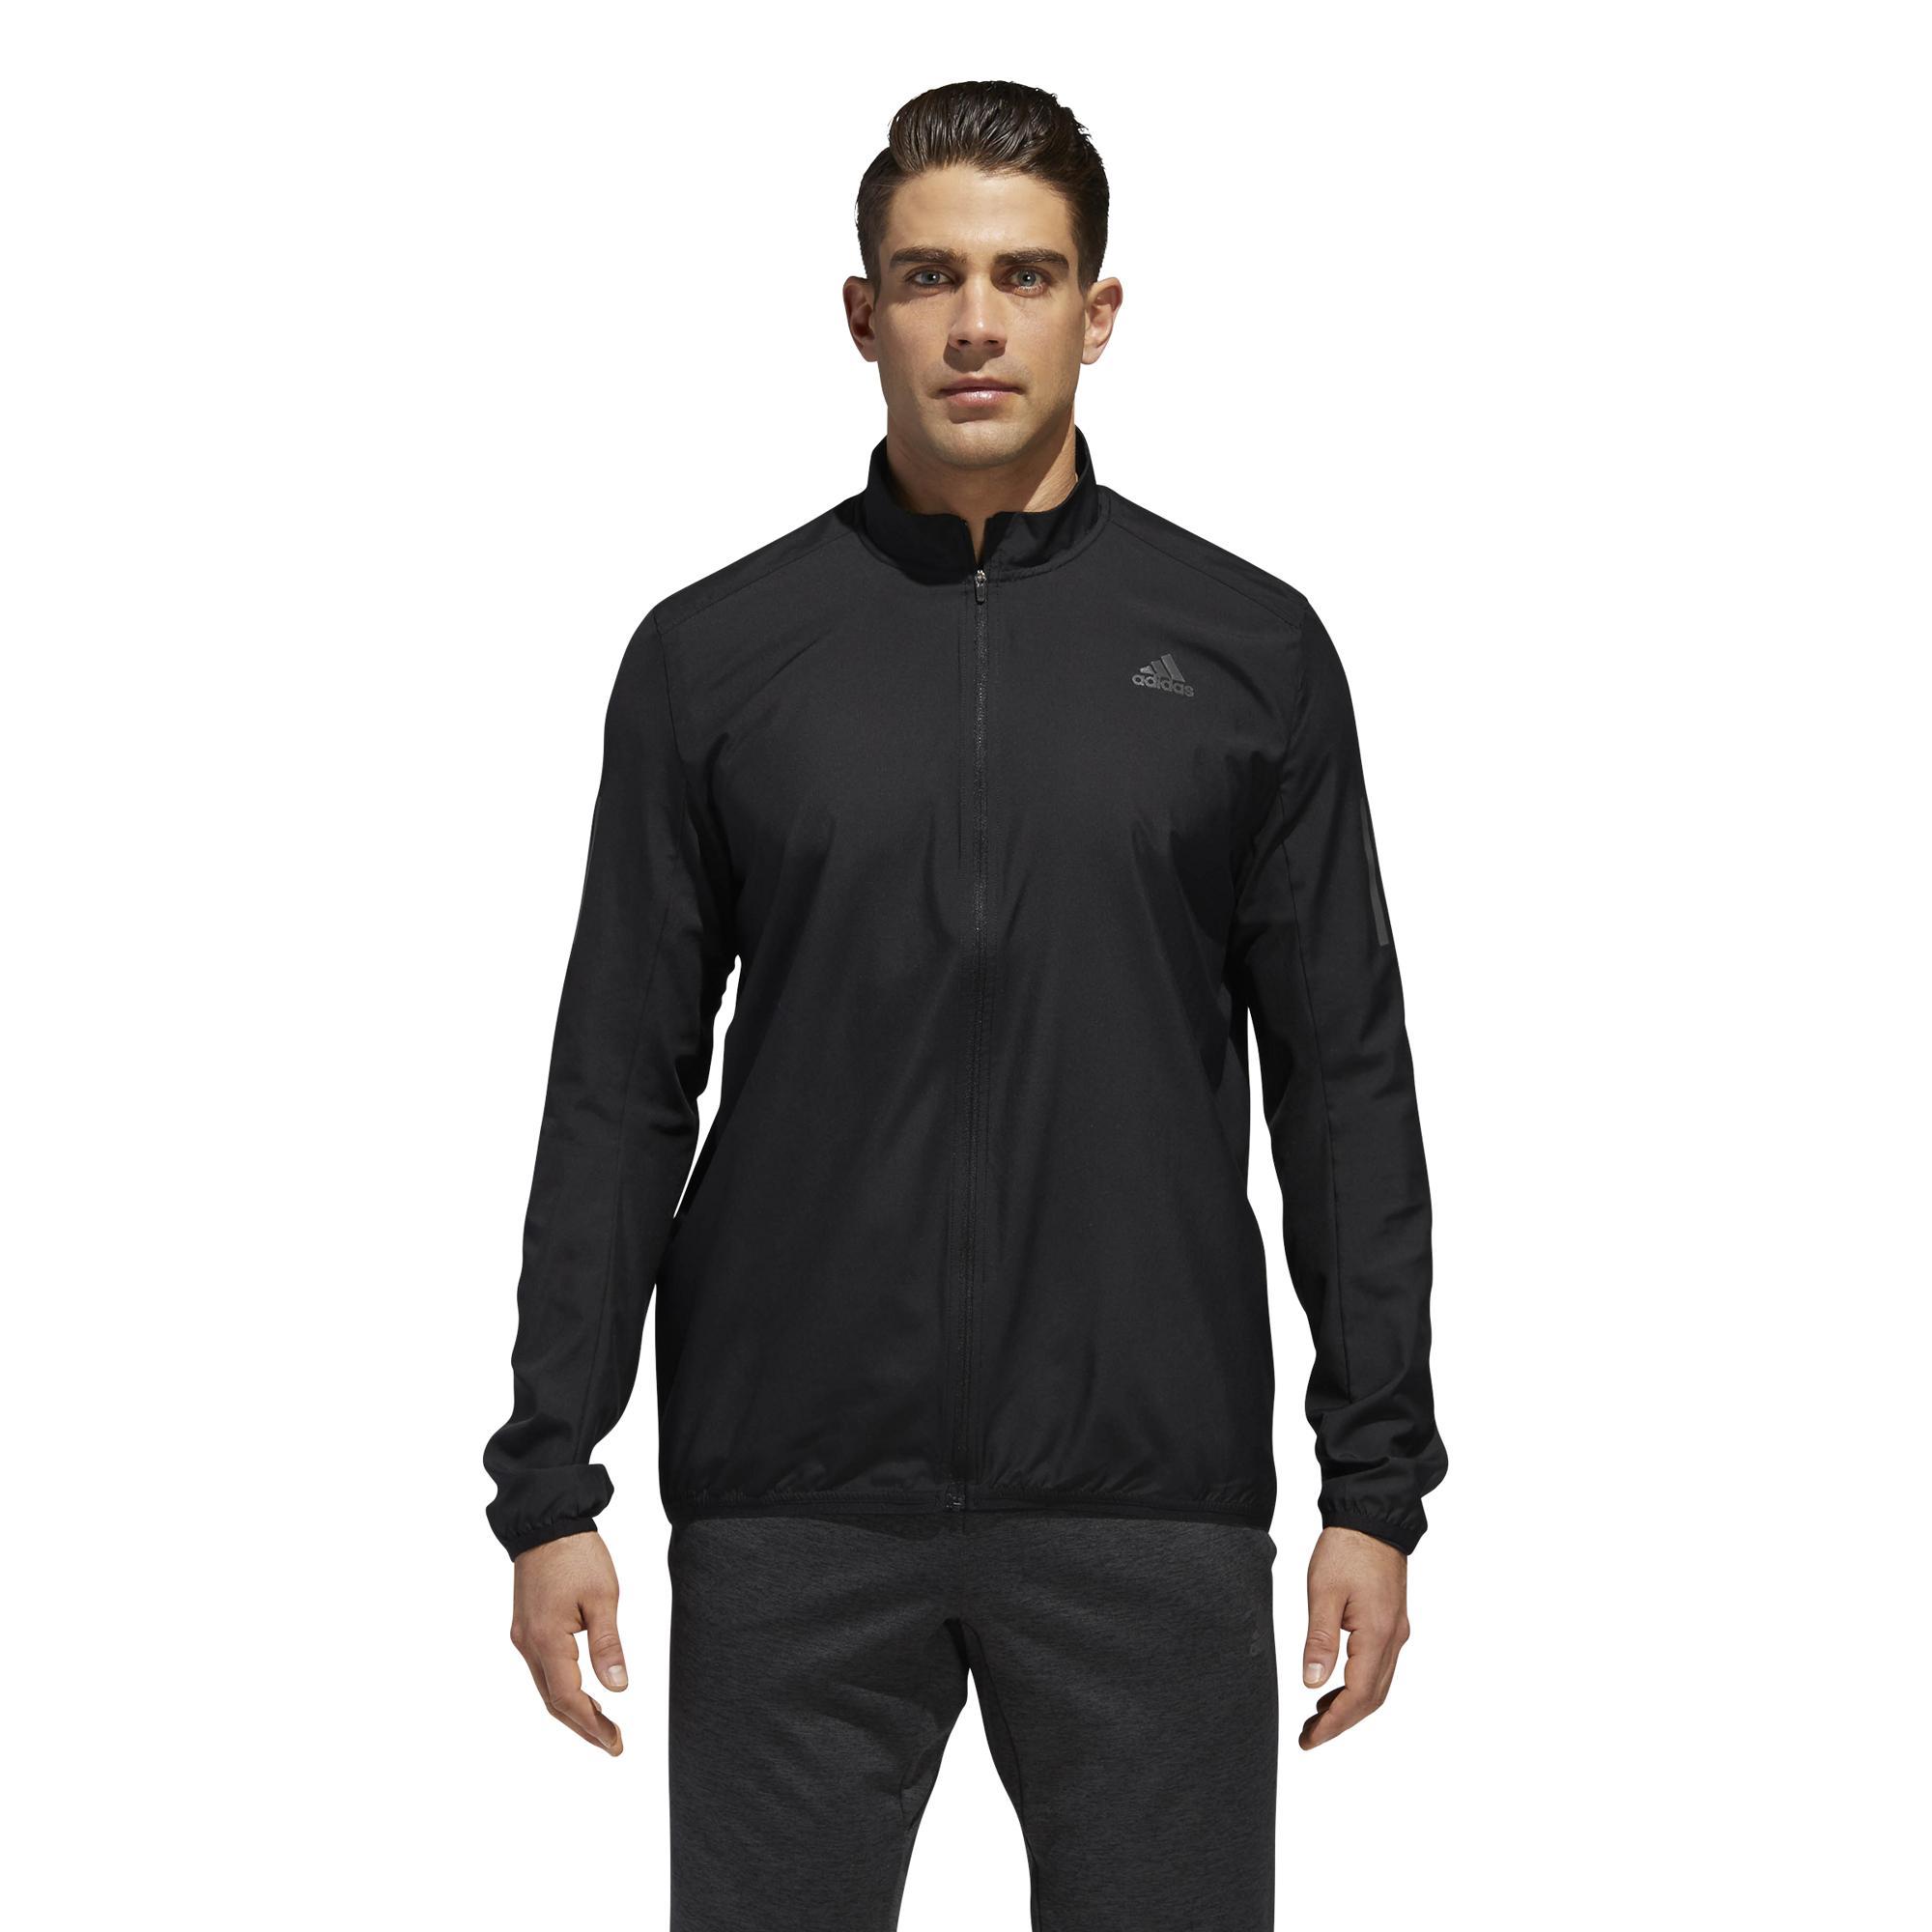 Jual Jaket Parka Olahraga Pria Adidas Varka V177 Sepatu Casual Wanita Running Mens Response Wind Cy5773